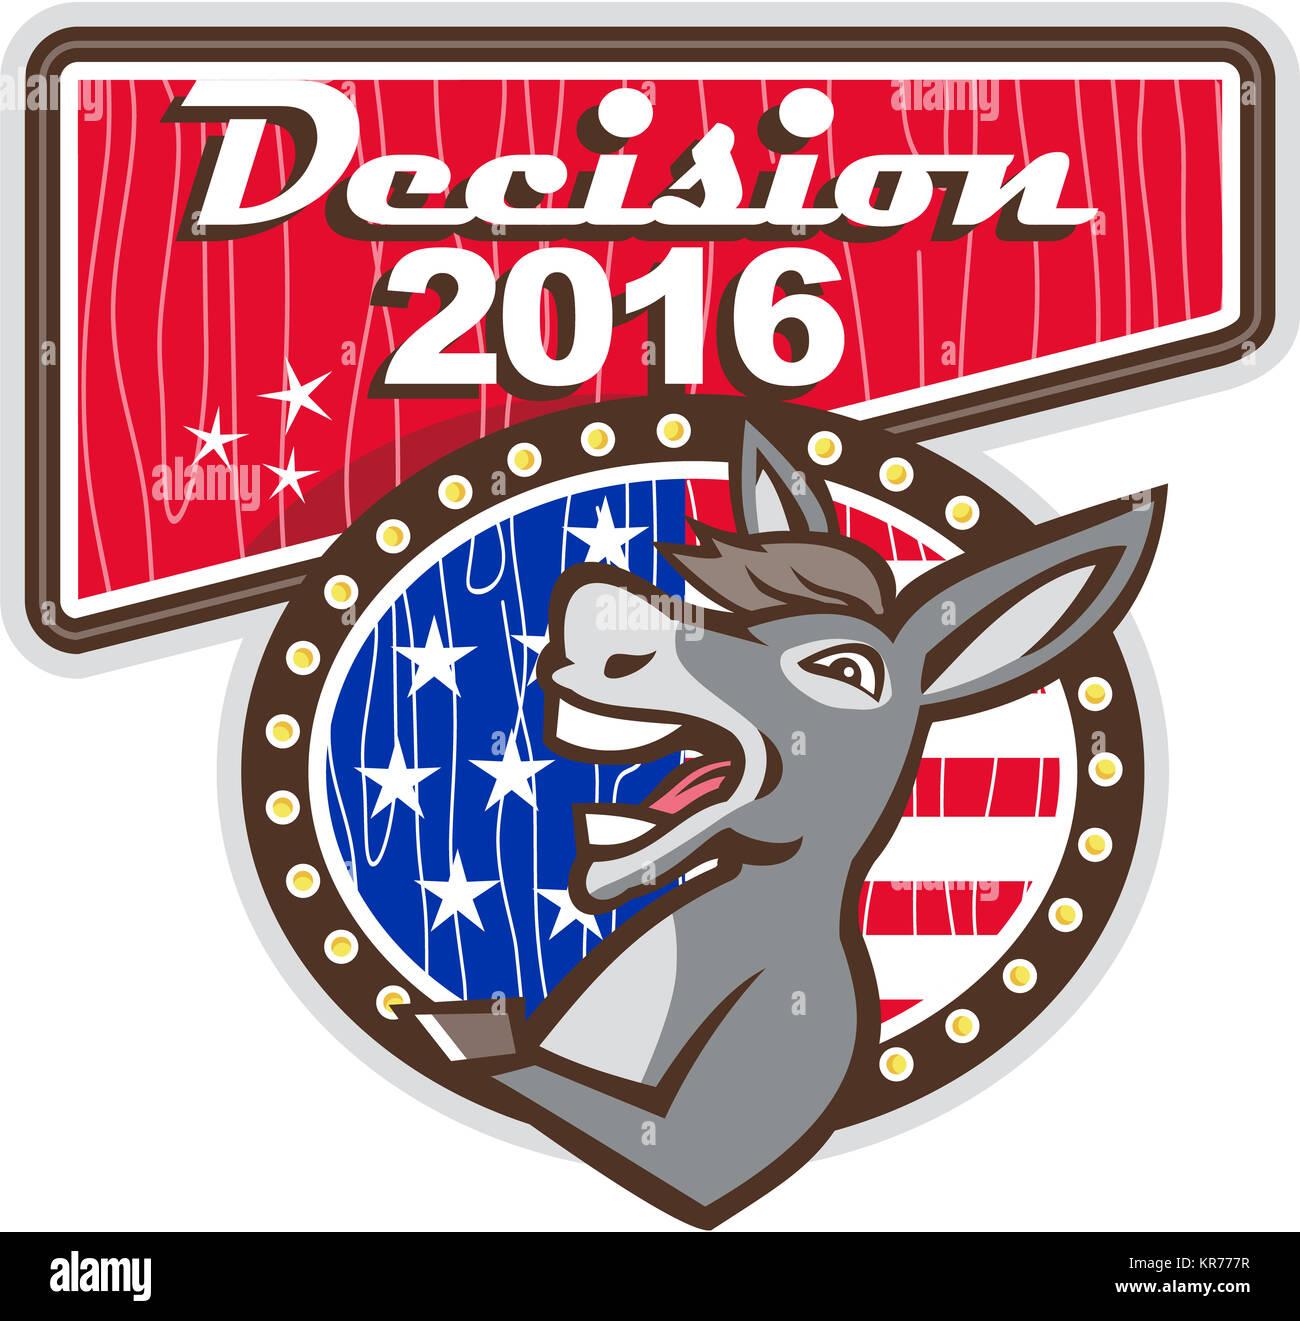 Decision 2016 Democrat Donkey - Stock Image